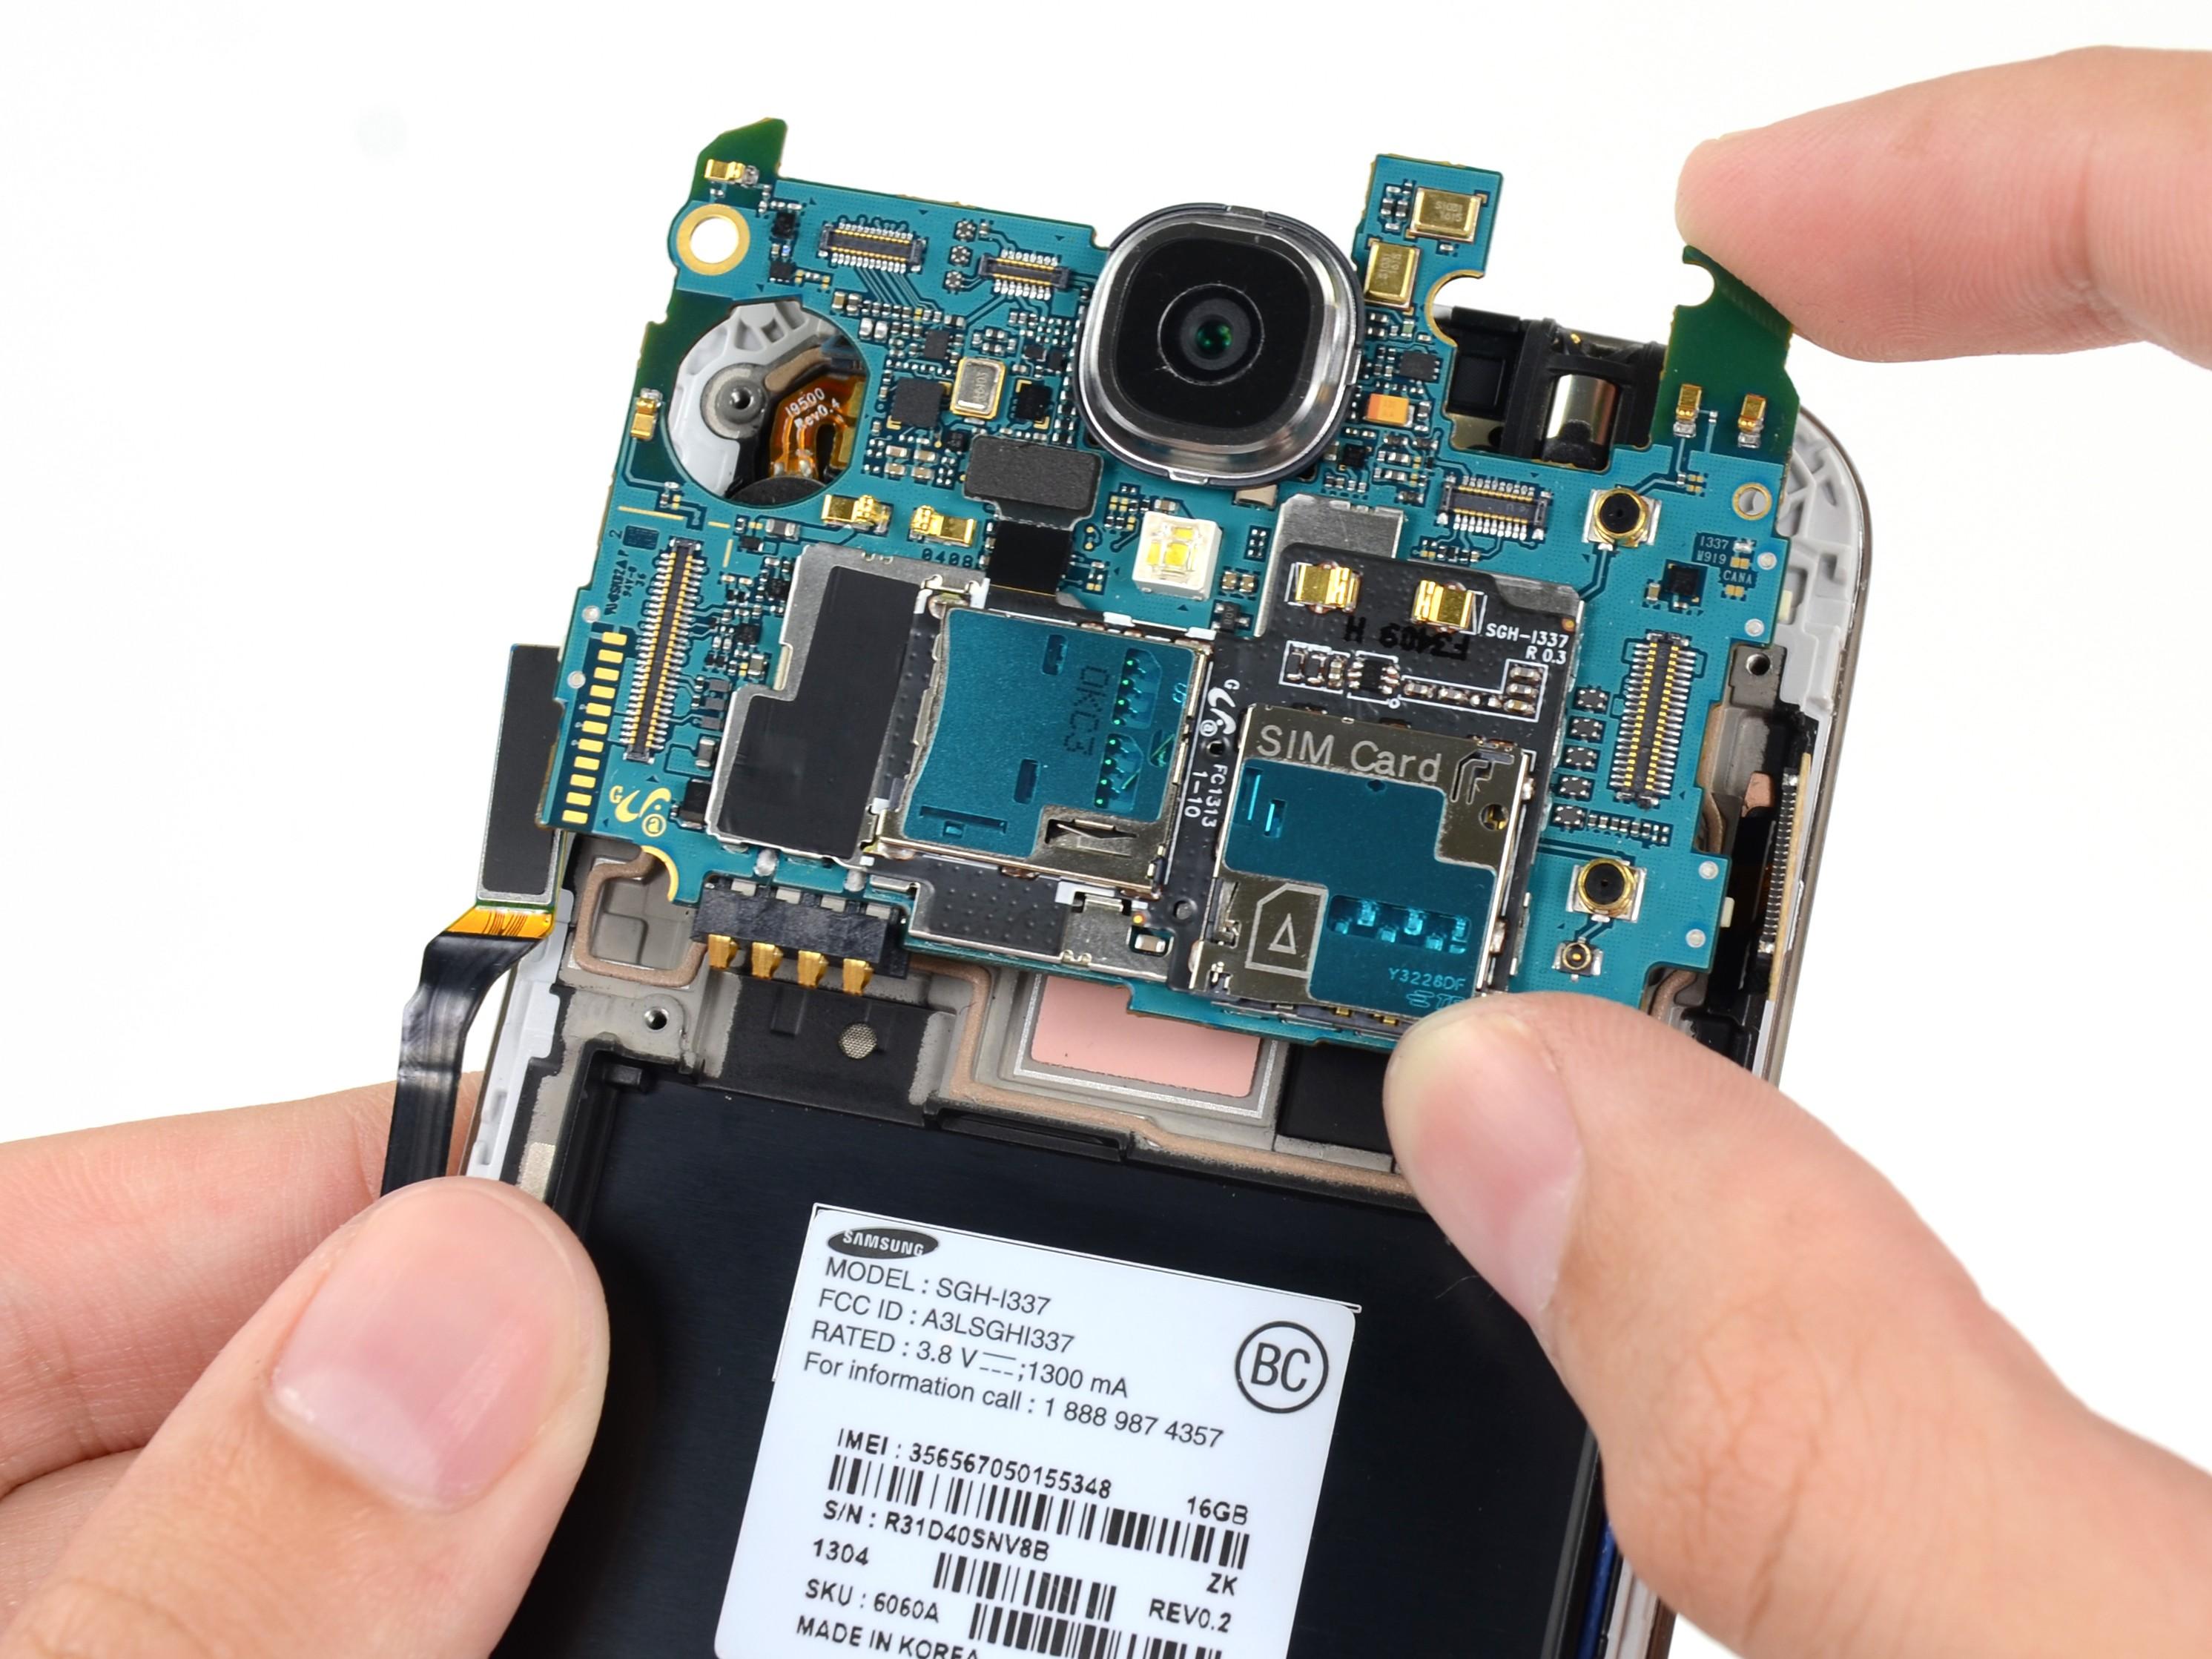 Sửa lỗi camera - Thay ic camera Galaxy S4